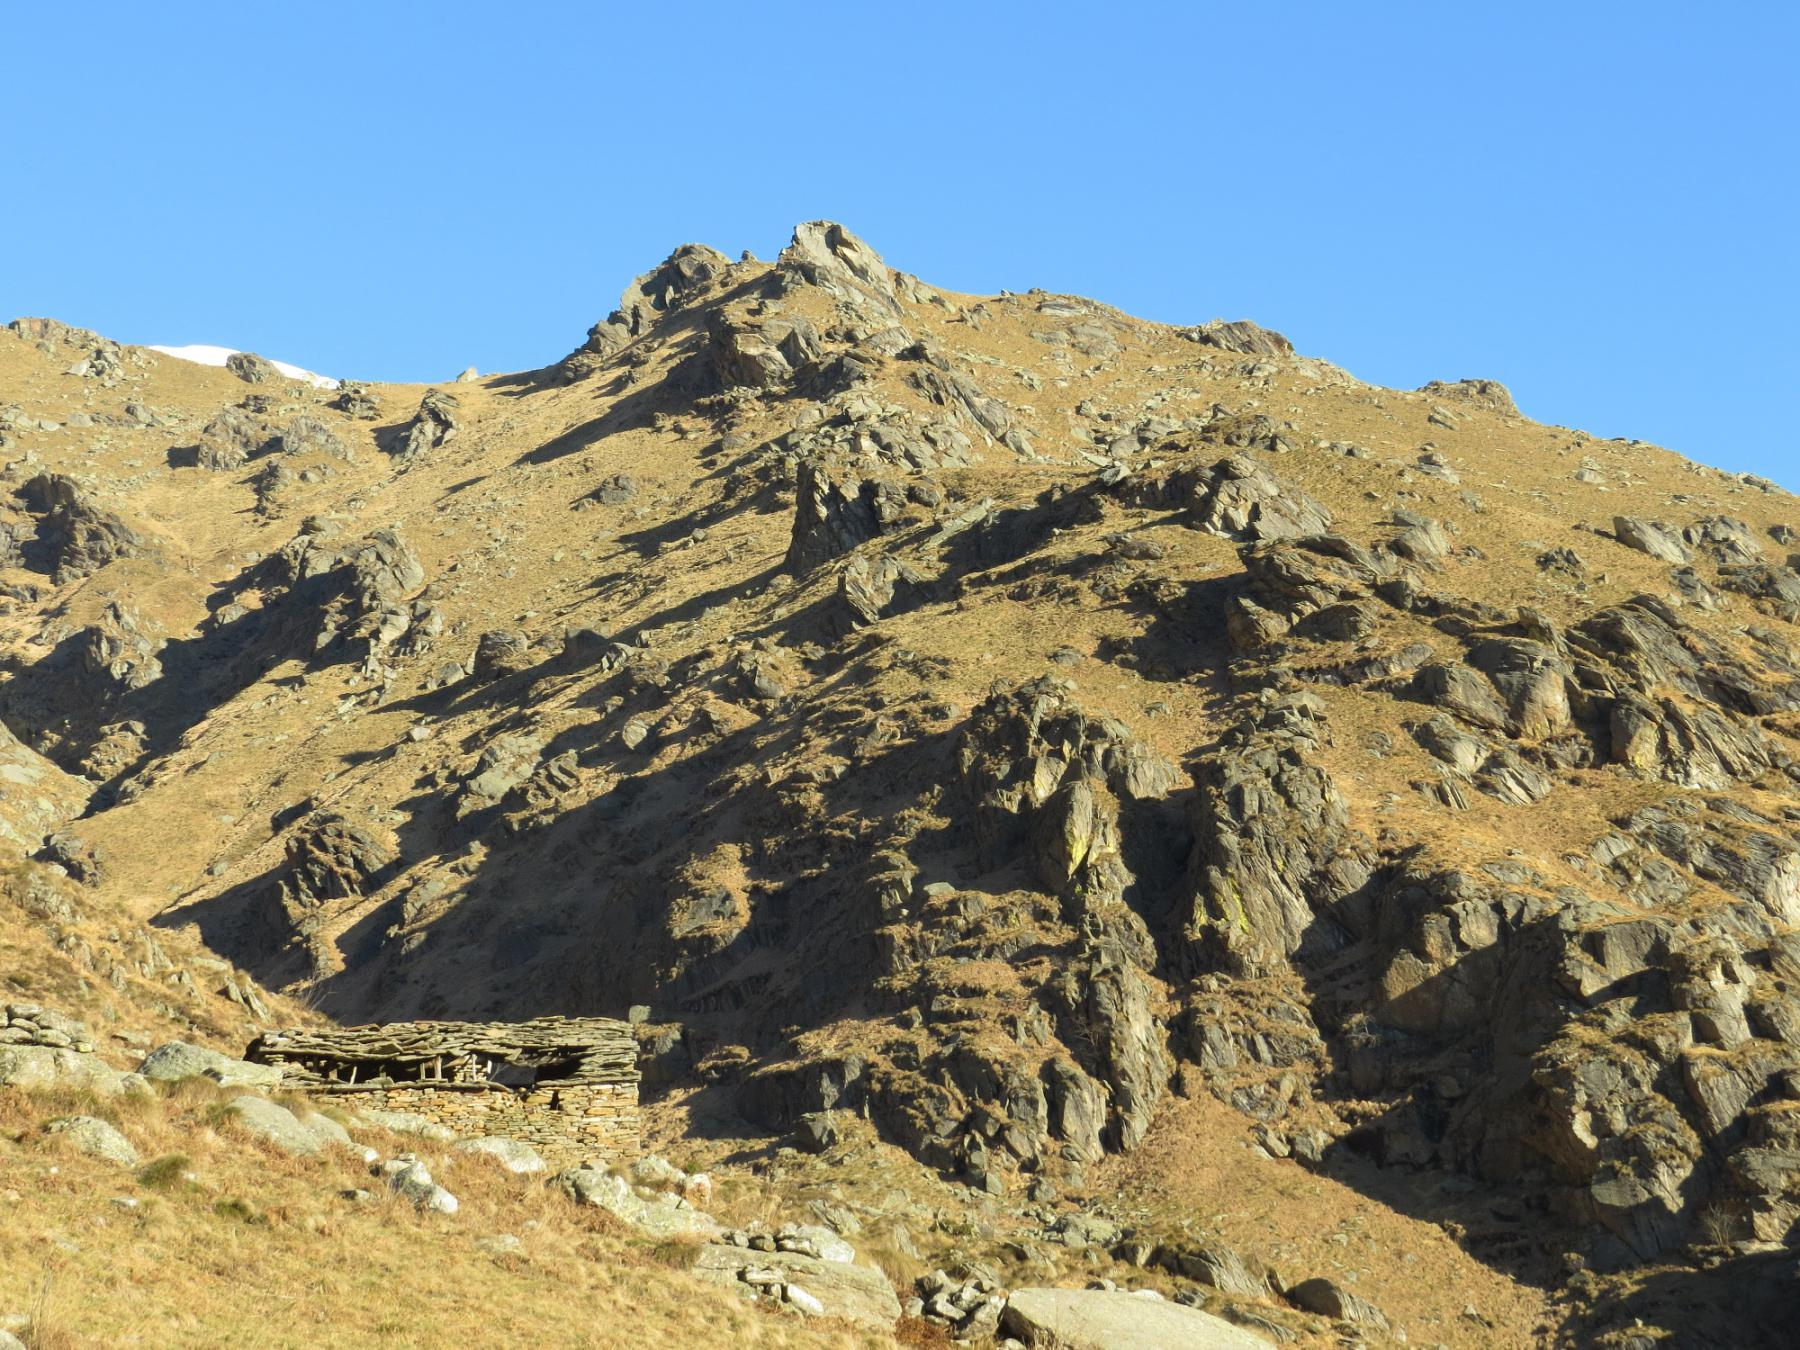 I versanti sud ovest del Bric Pistone